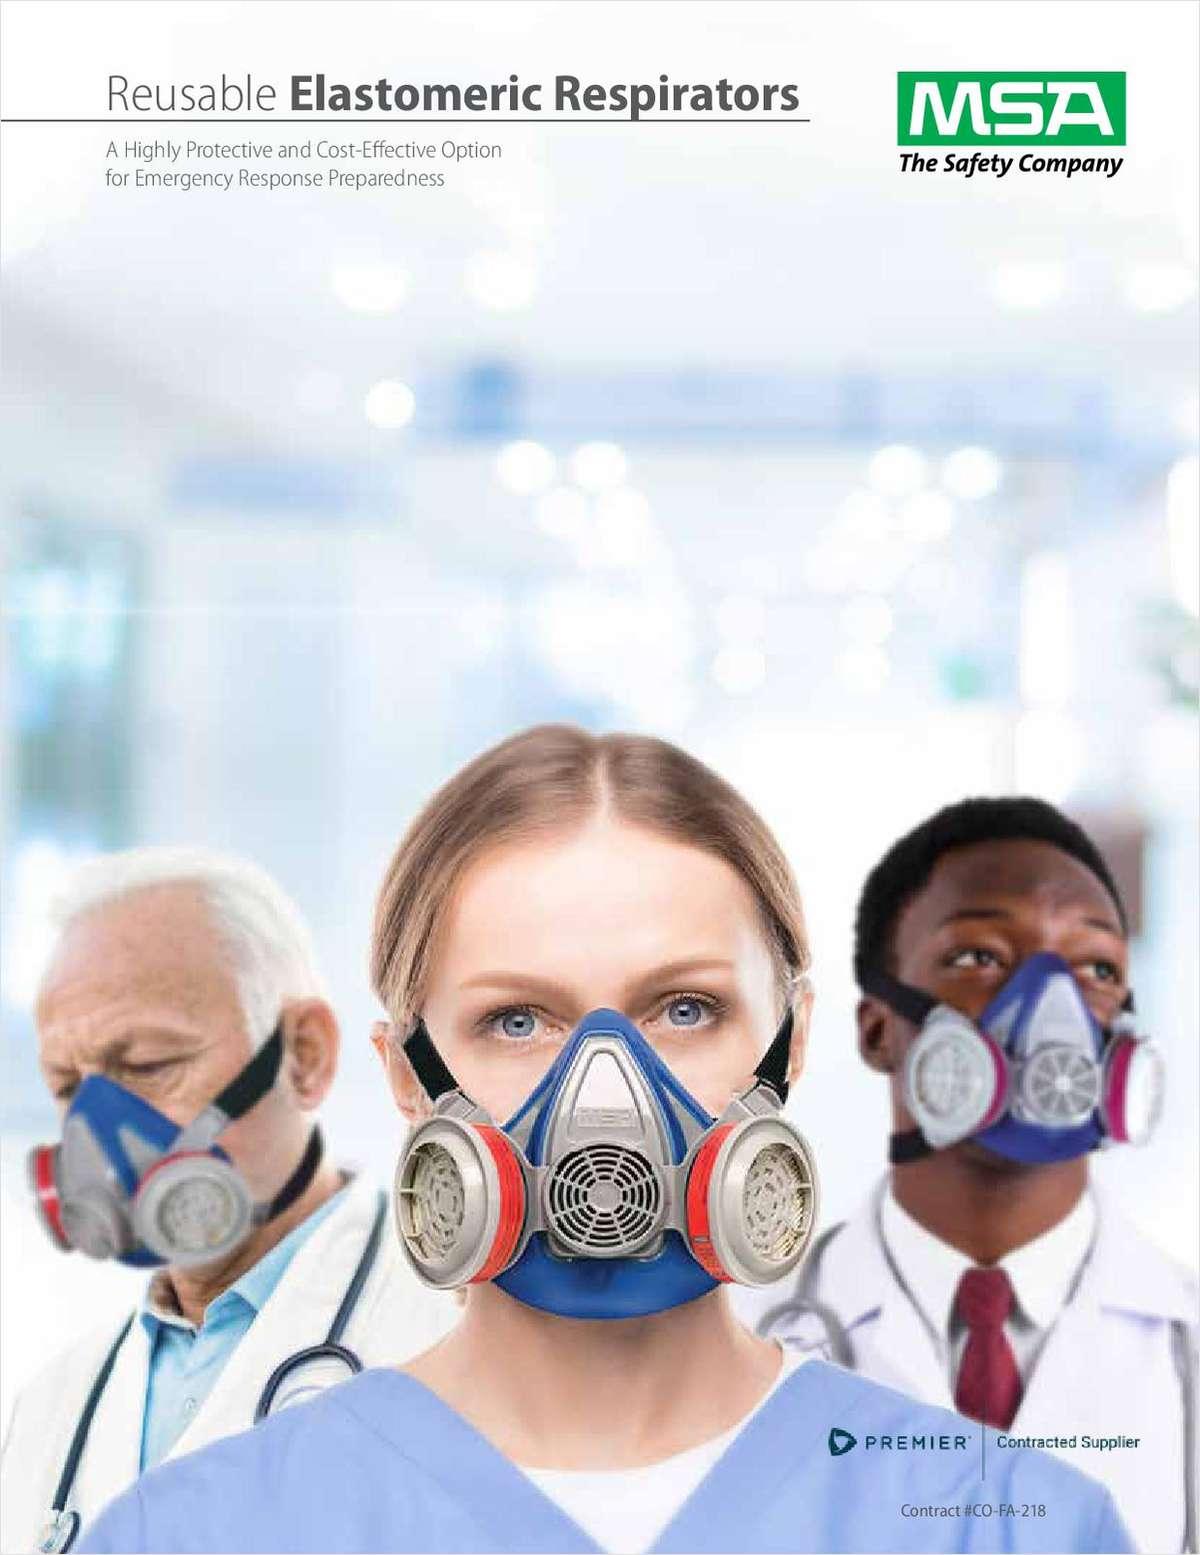 Reusable Elastomeric Respirators: A highly effective option for emergency response preparedness